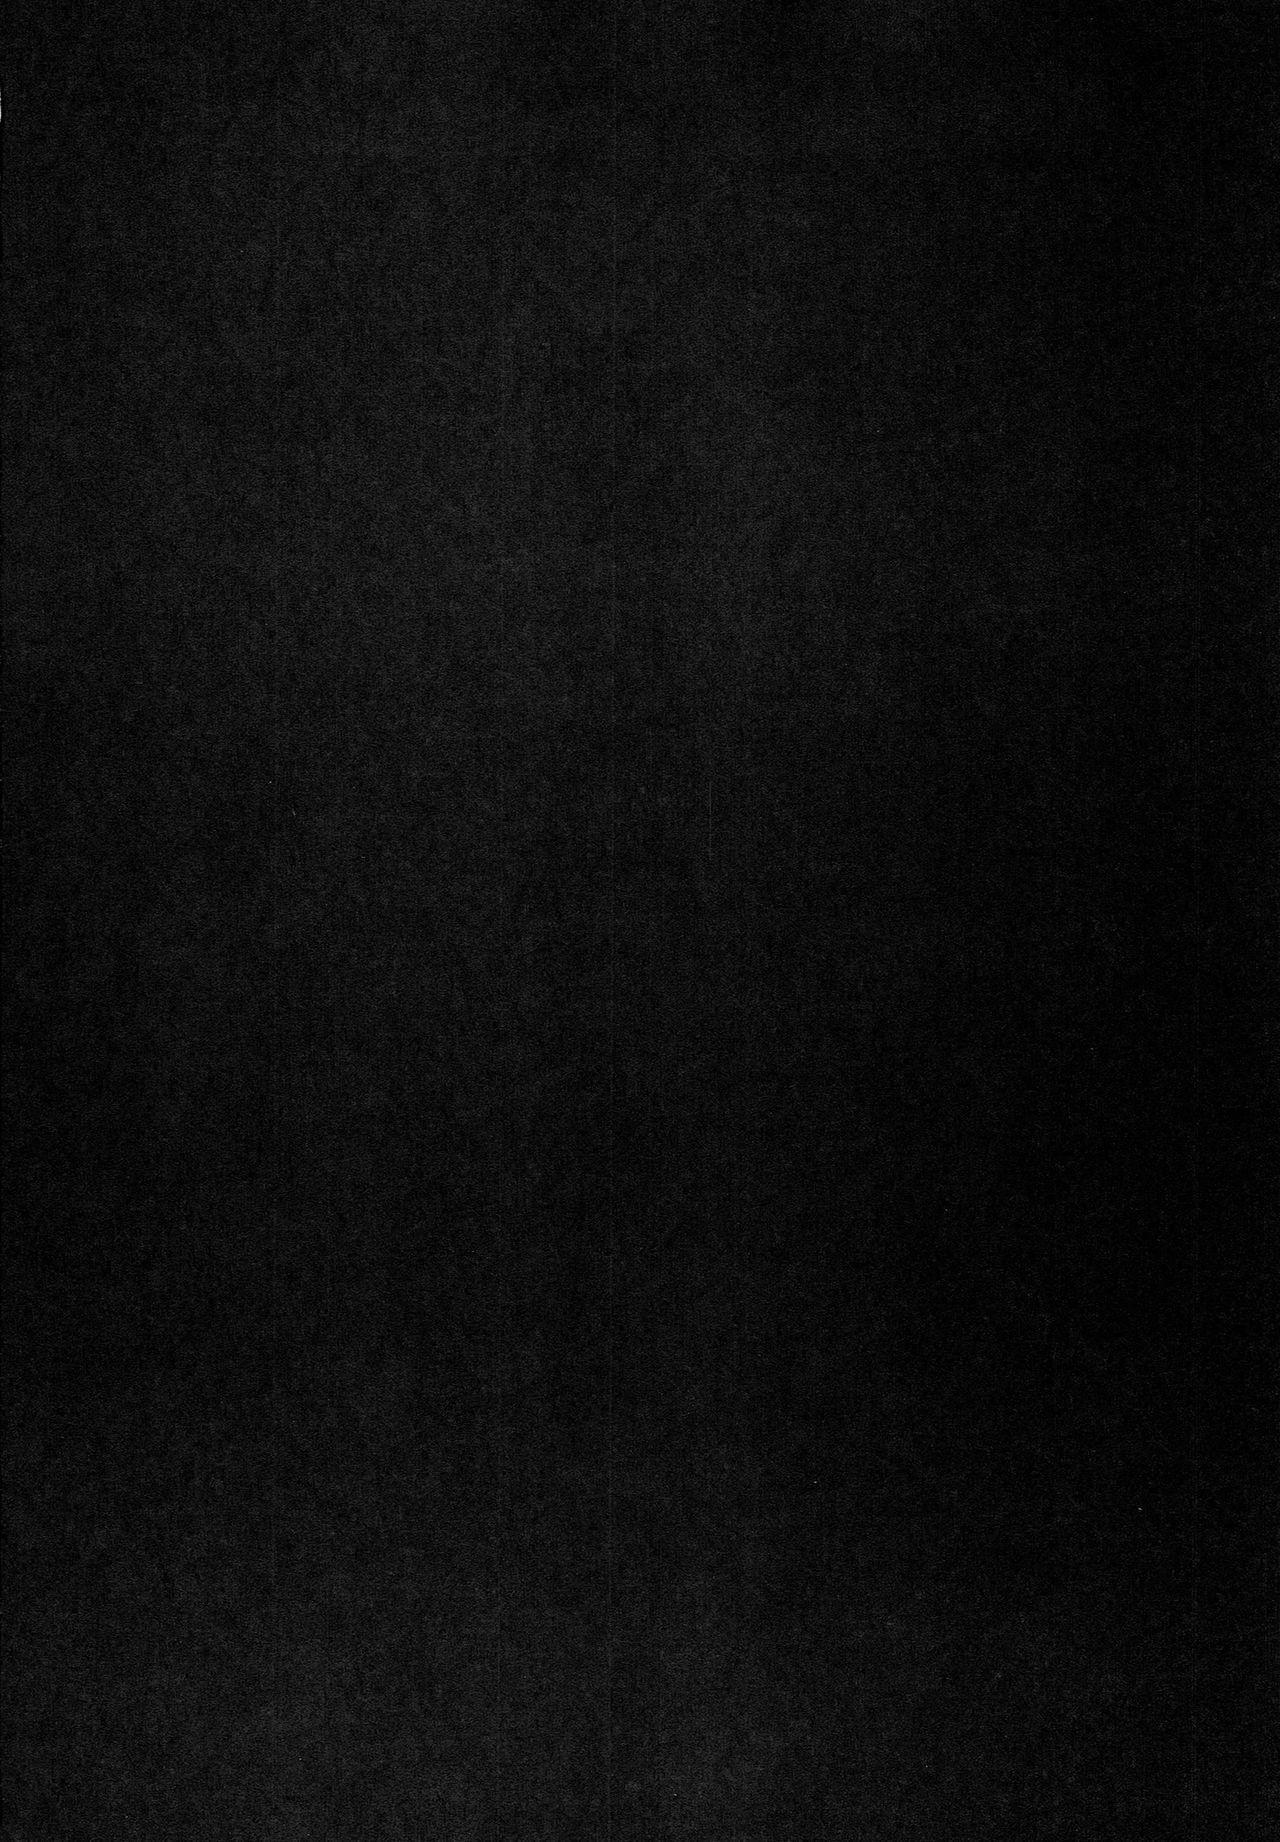 Araragi Darkness 19